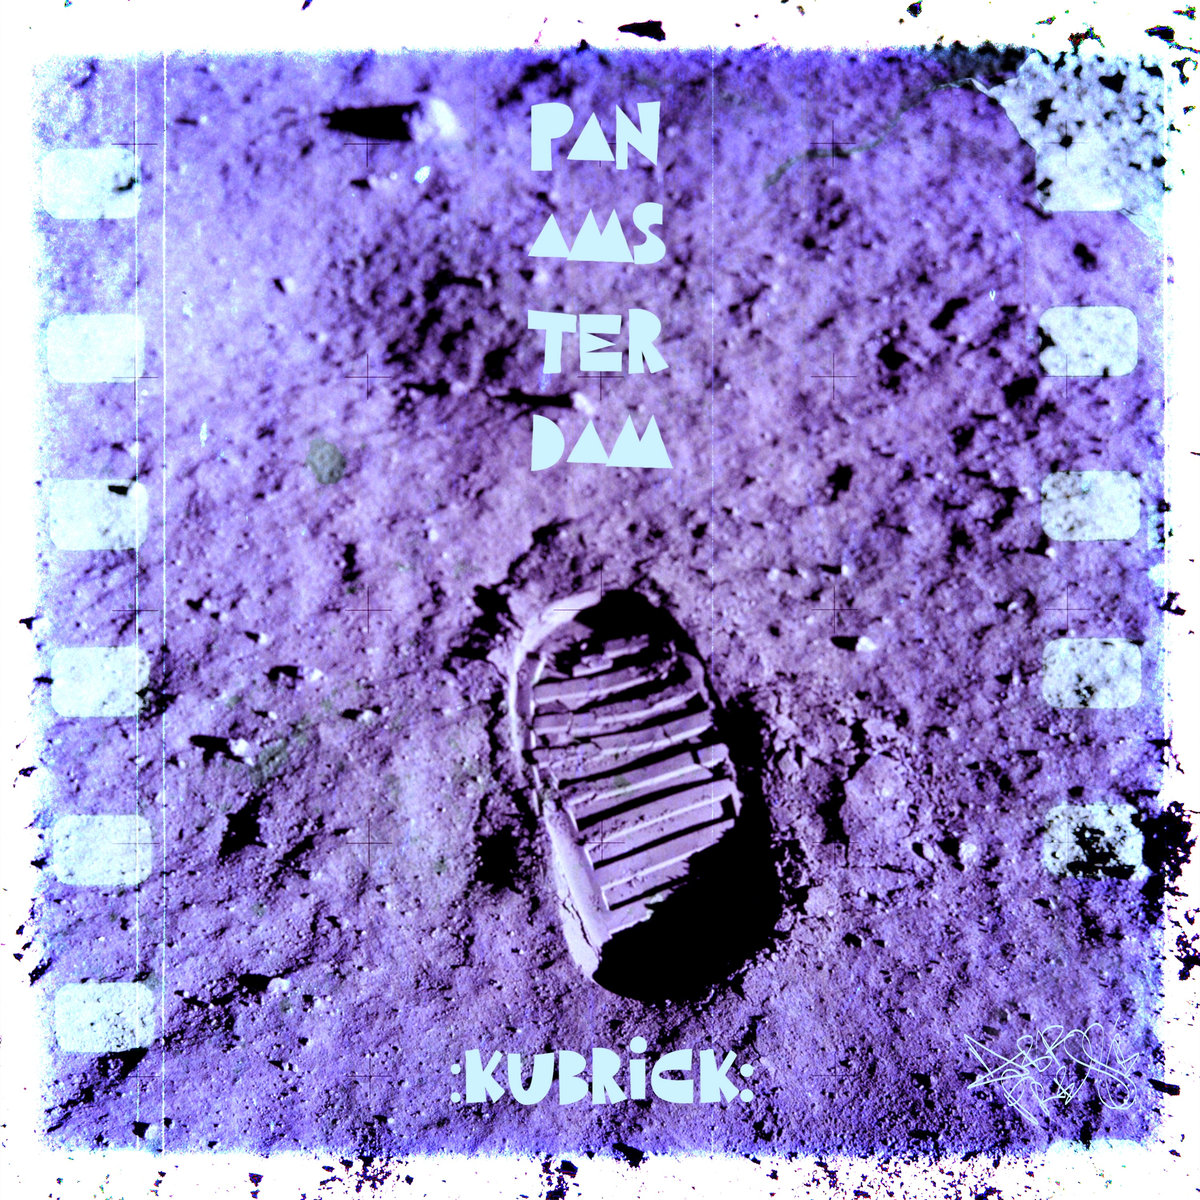 Listen: Pan Amsterdam – Kubrick